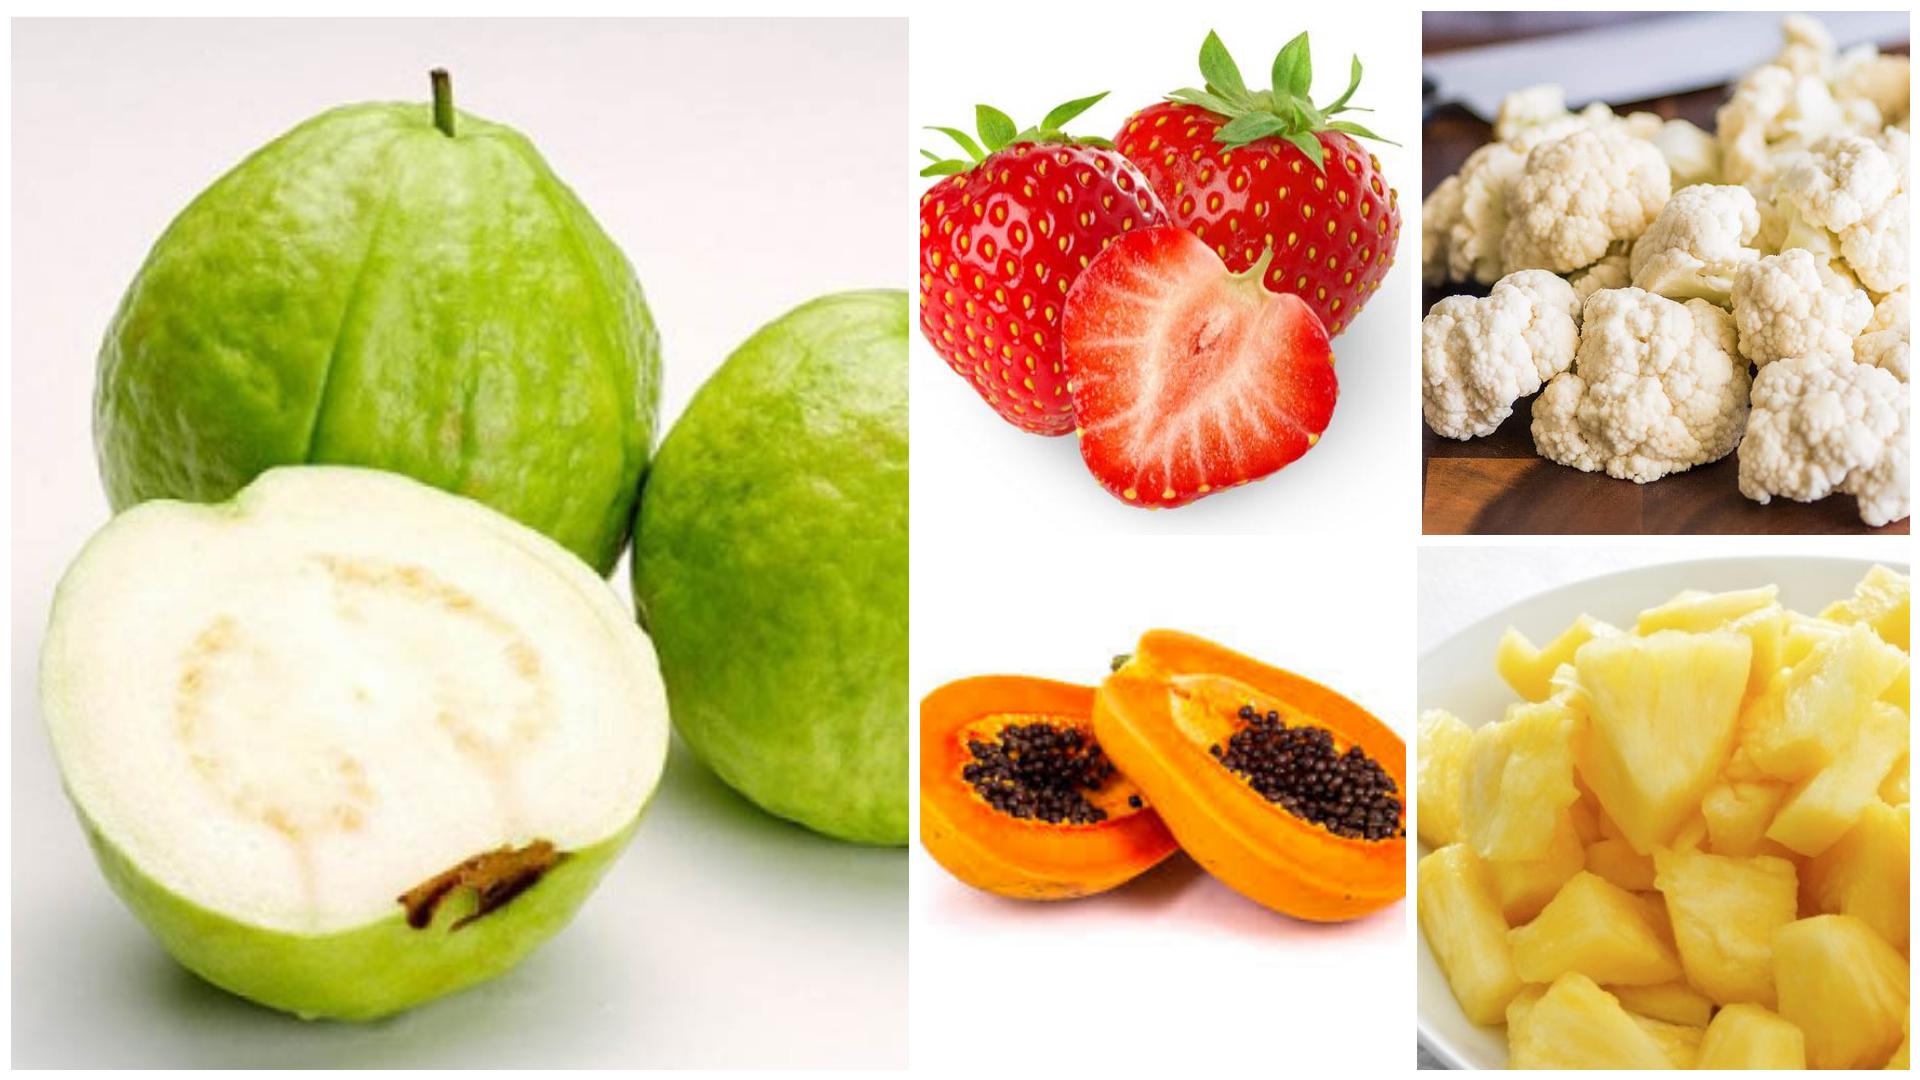 9 Jenis Buah Sayur Yang Lebih Tinggi Vitamin C Berbanding Oren